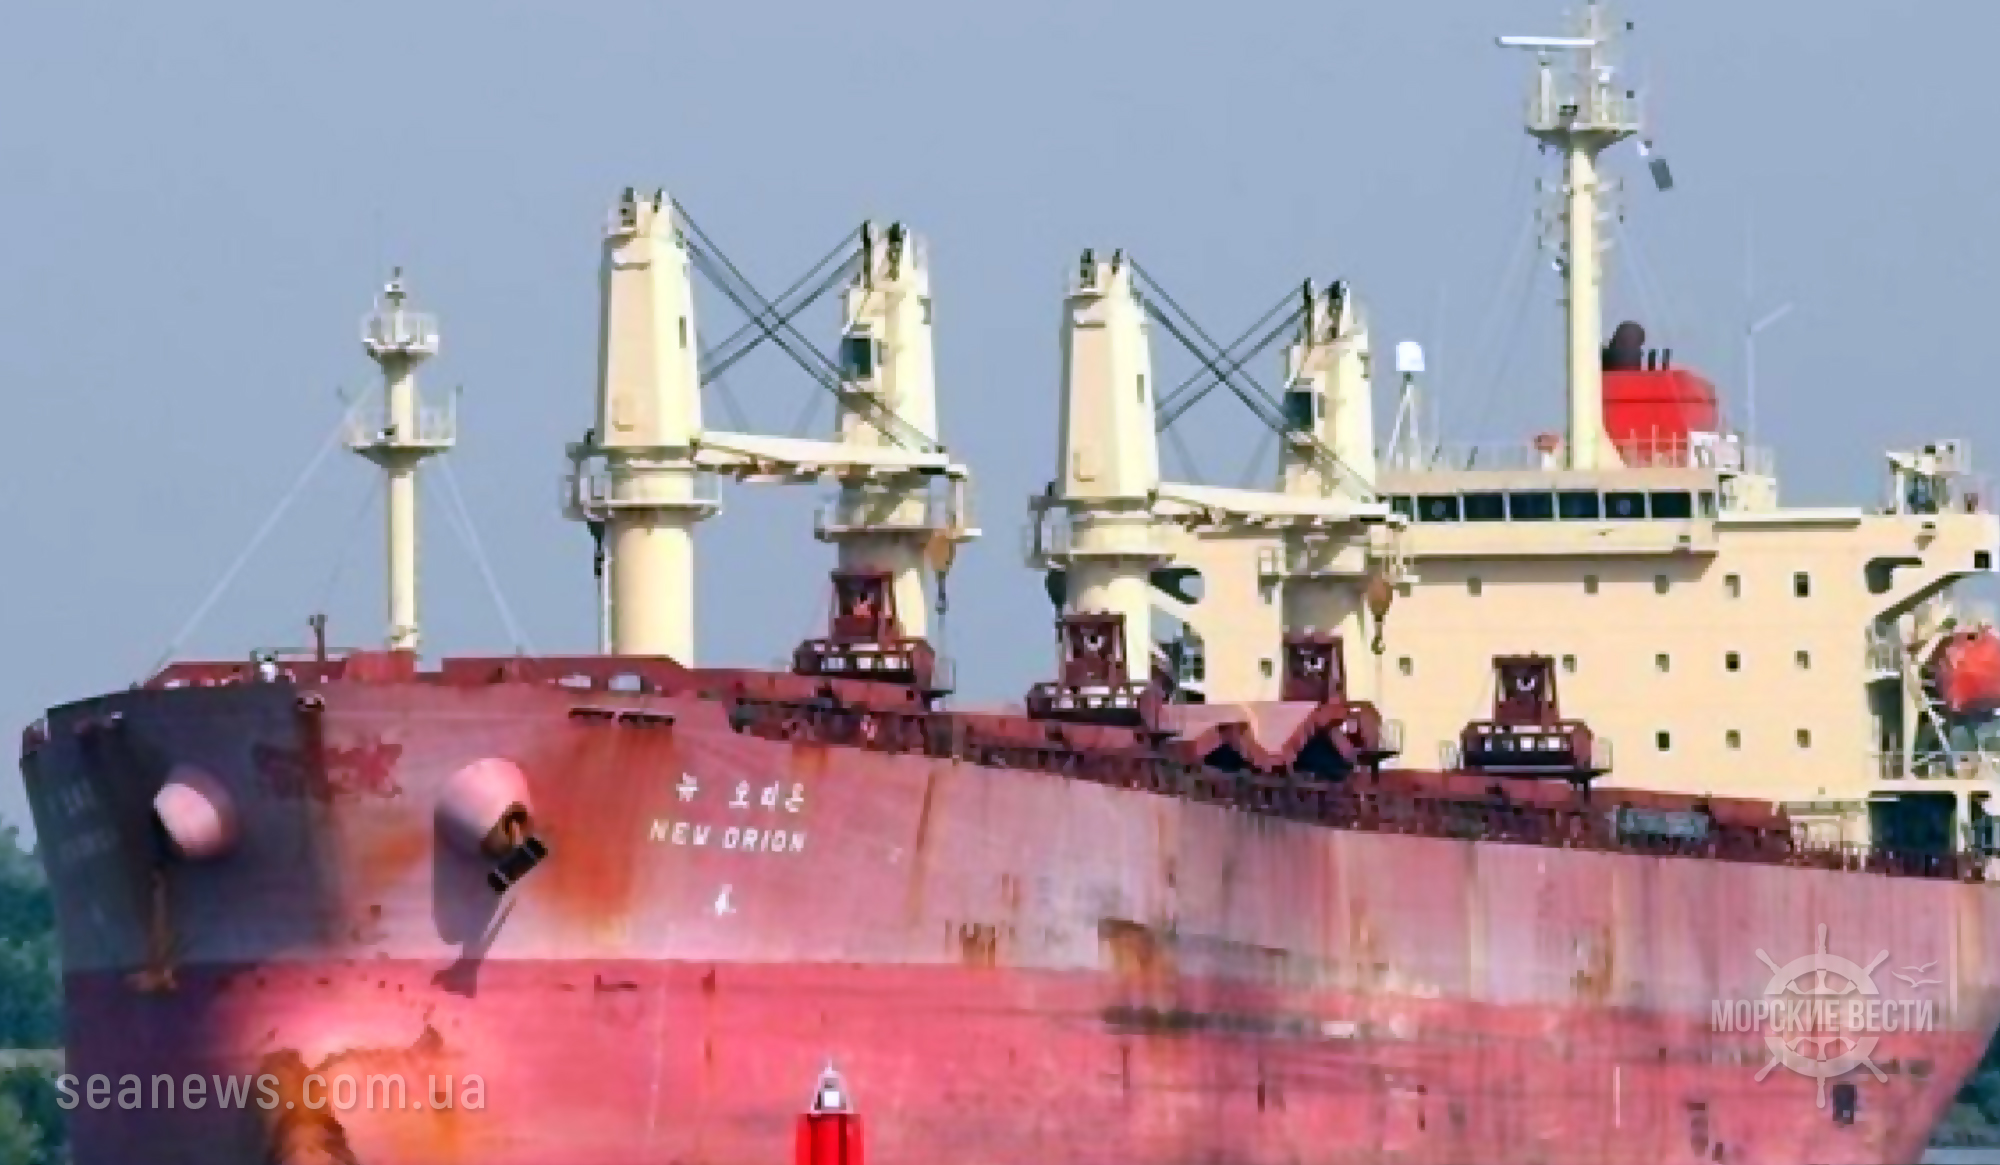 В Малайзии задержано судно с украинцами на борту